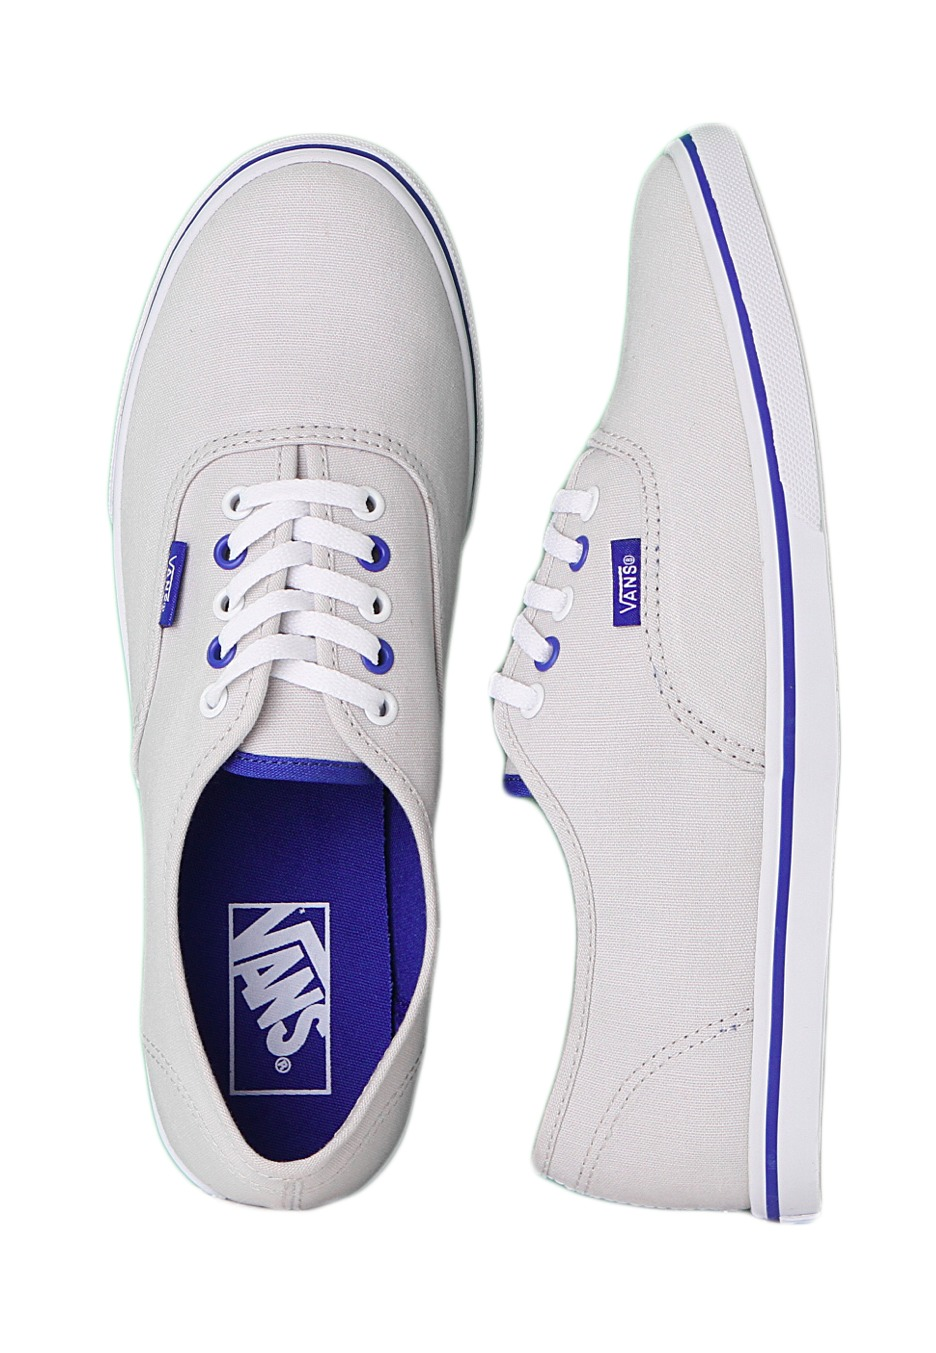 94155c4edf Vans - Authentic Lo Pro Lunar Rock True White - Girl Shoes - Impericon.com  Worldwide